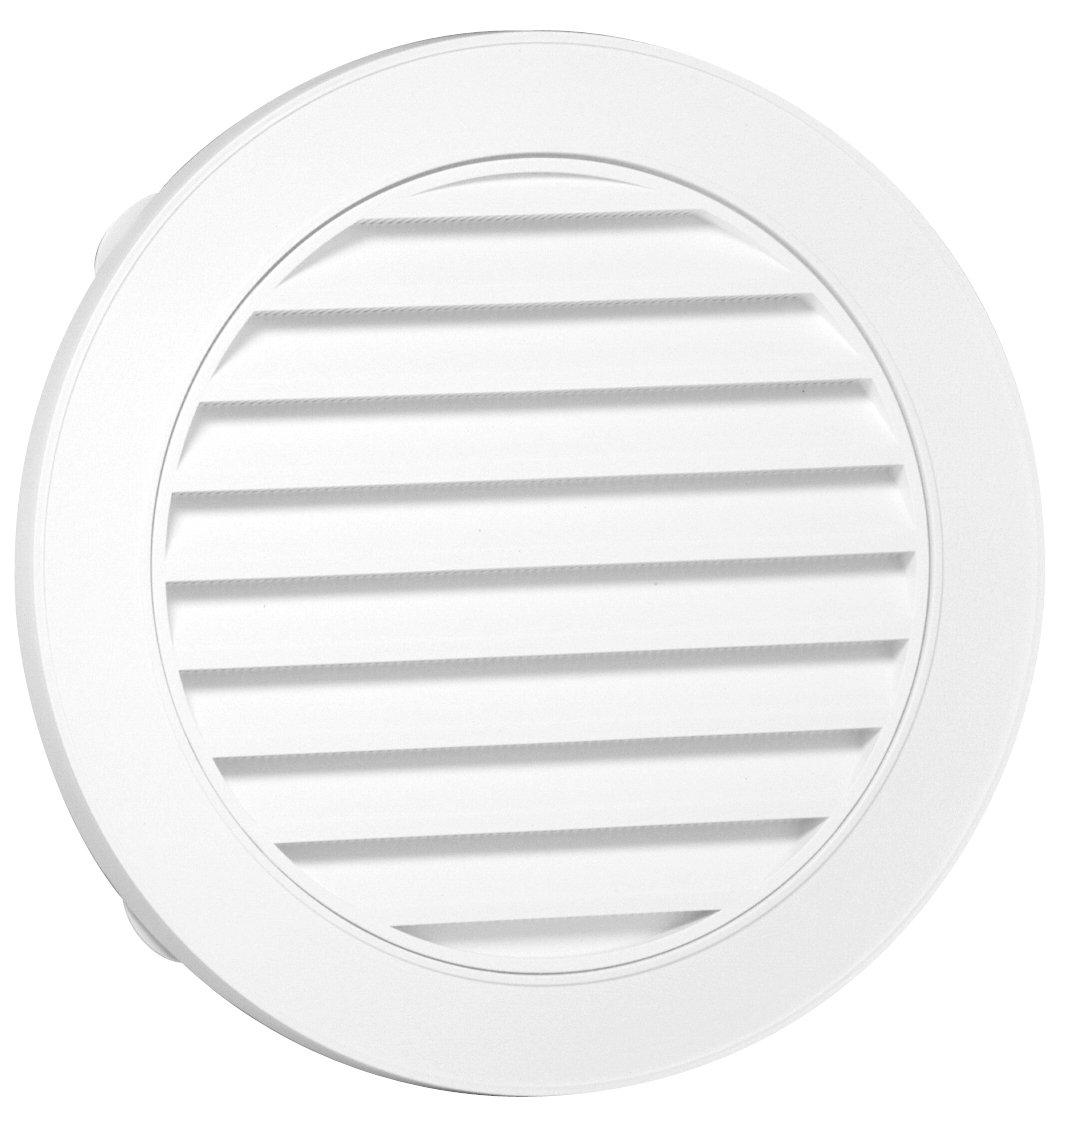 Duraflo 626055-00 22-Inch Round Gable Vent, White